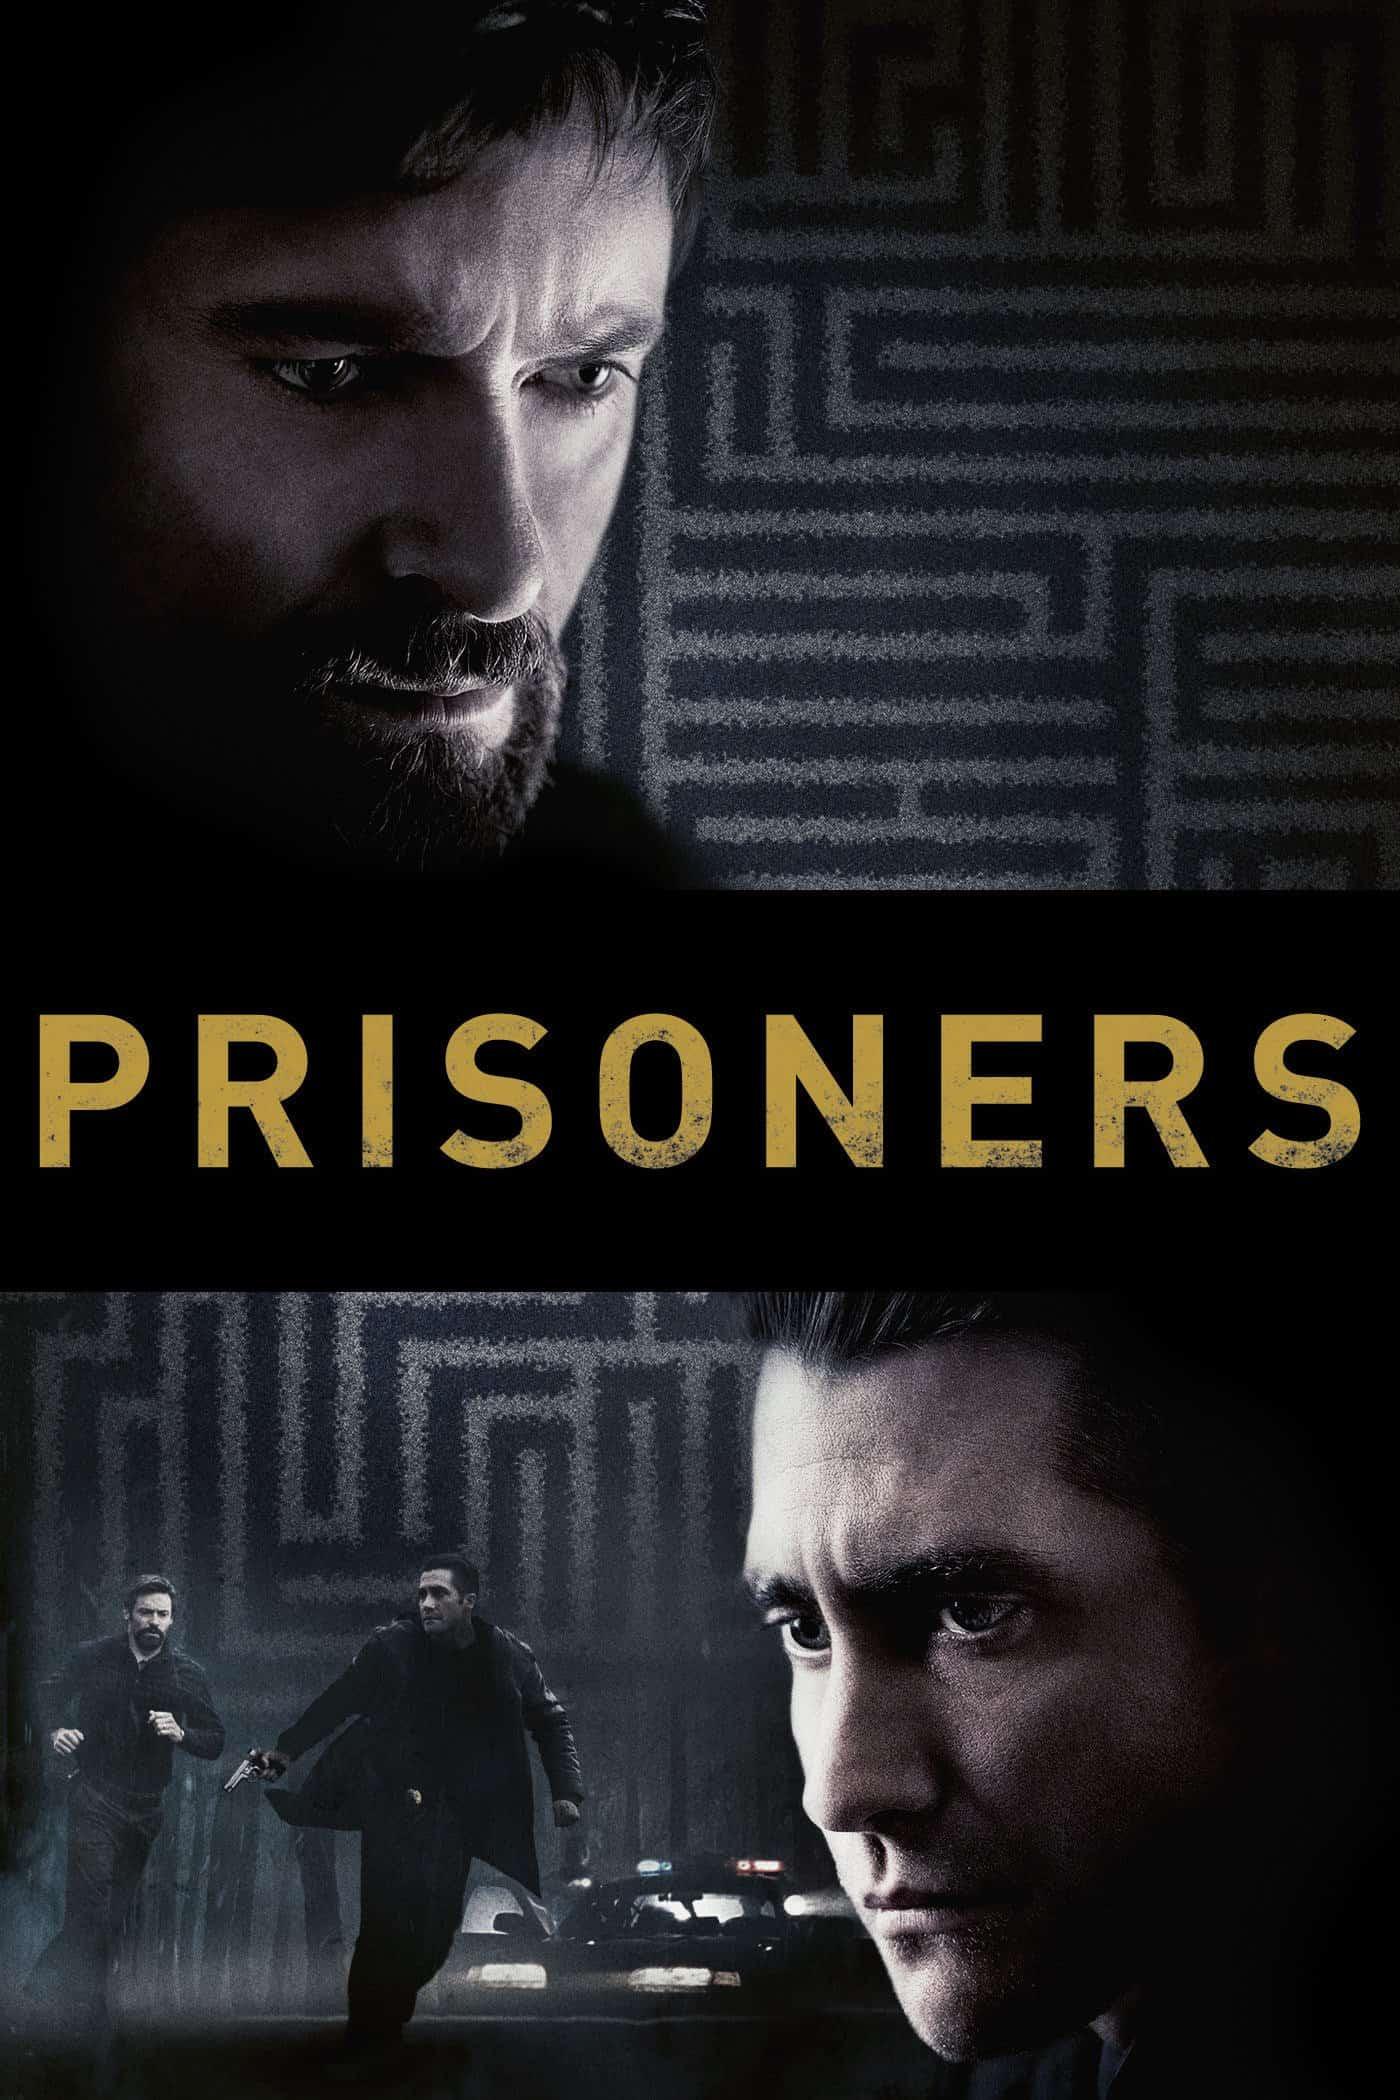 Prisoners, 2013